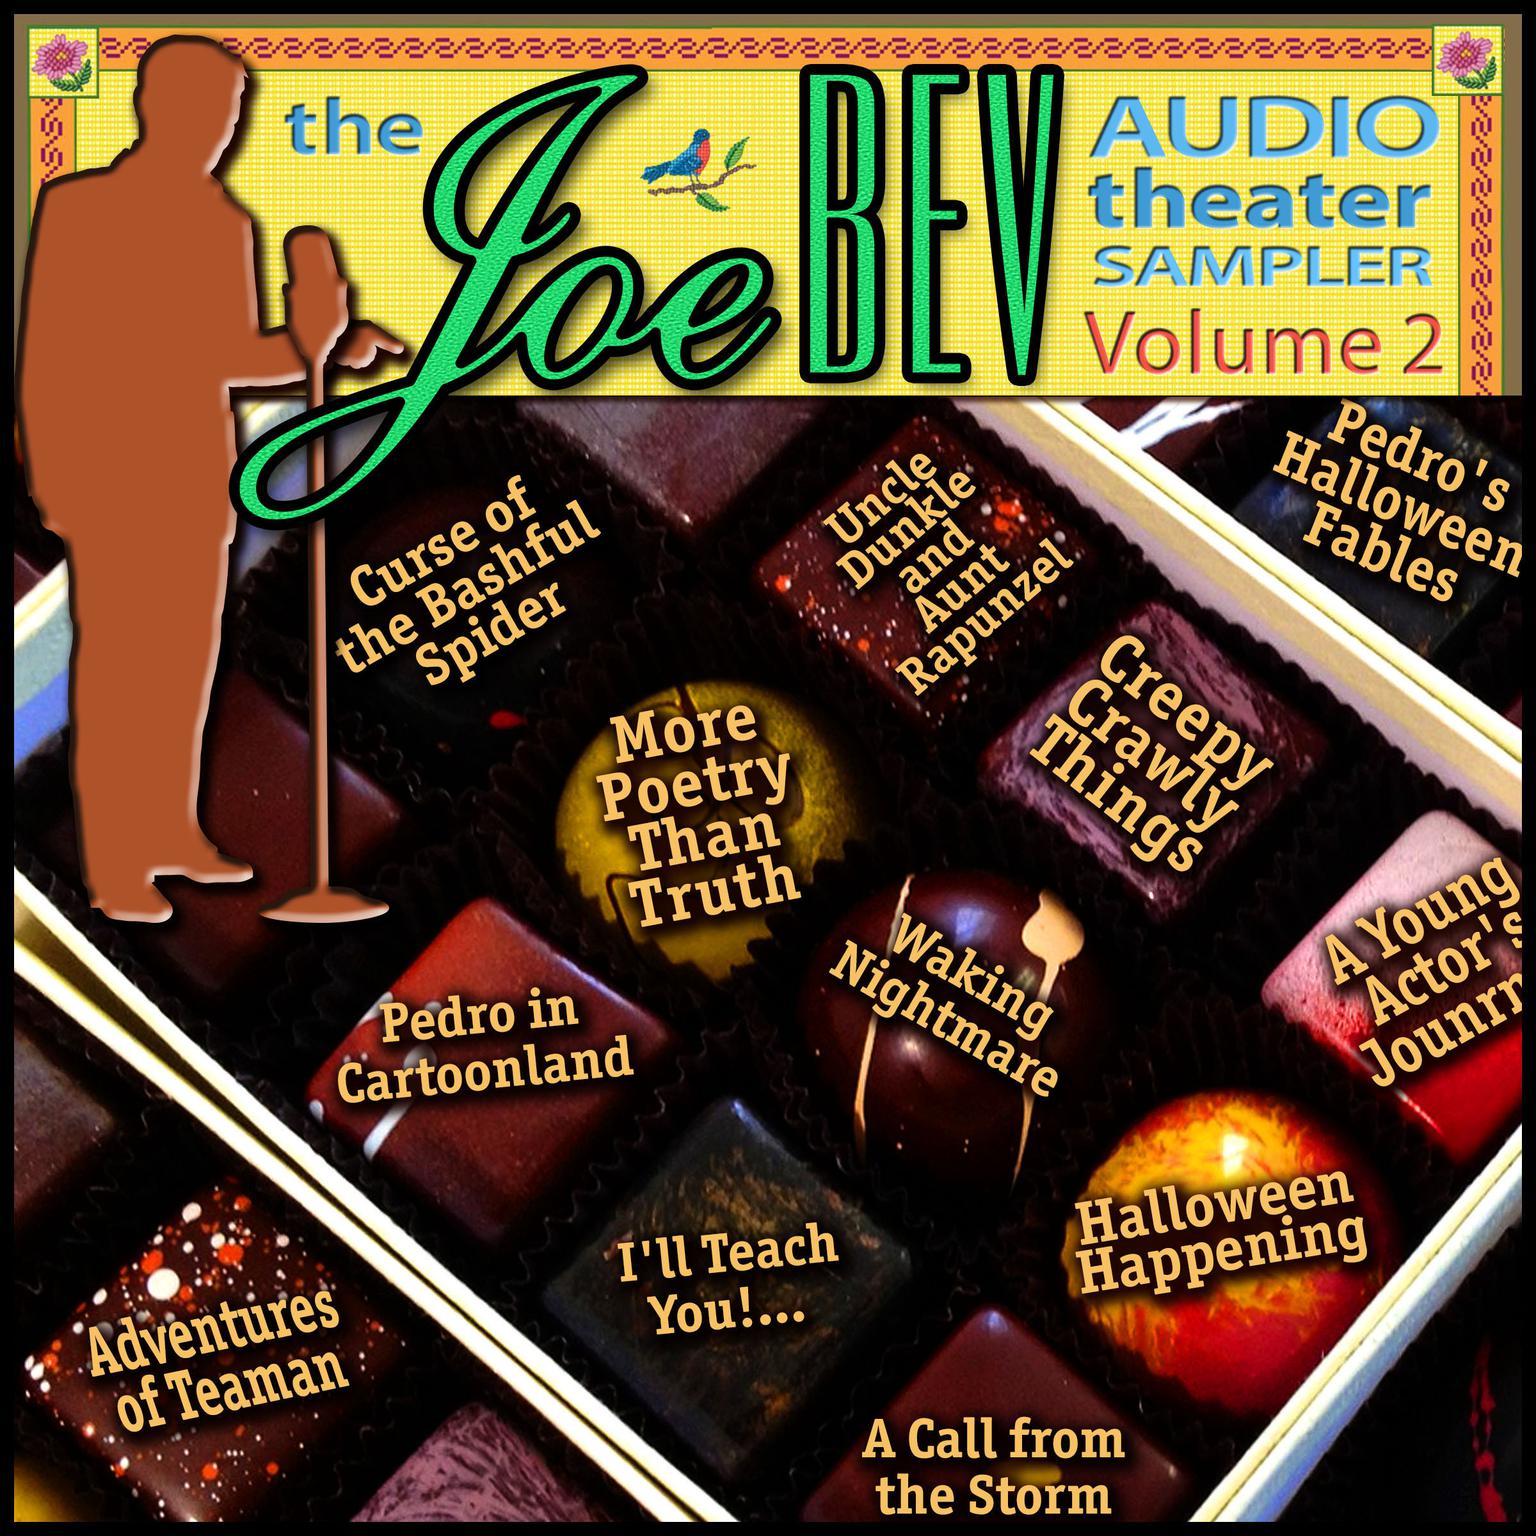 Printable A Joe Bev Audio Theater Sampler, Vol. 2 Audiobook Cover Art